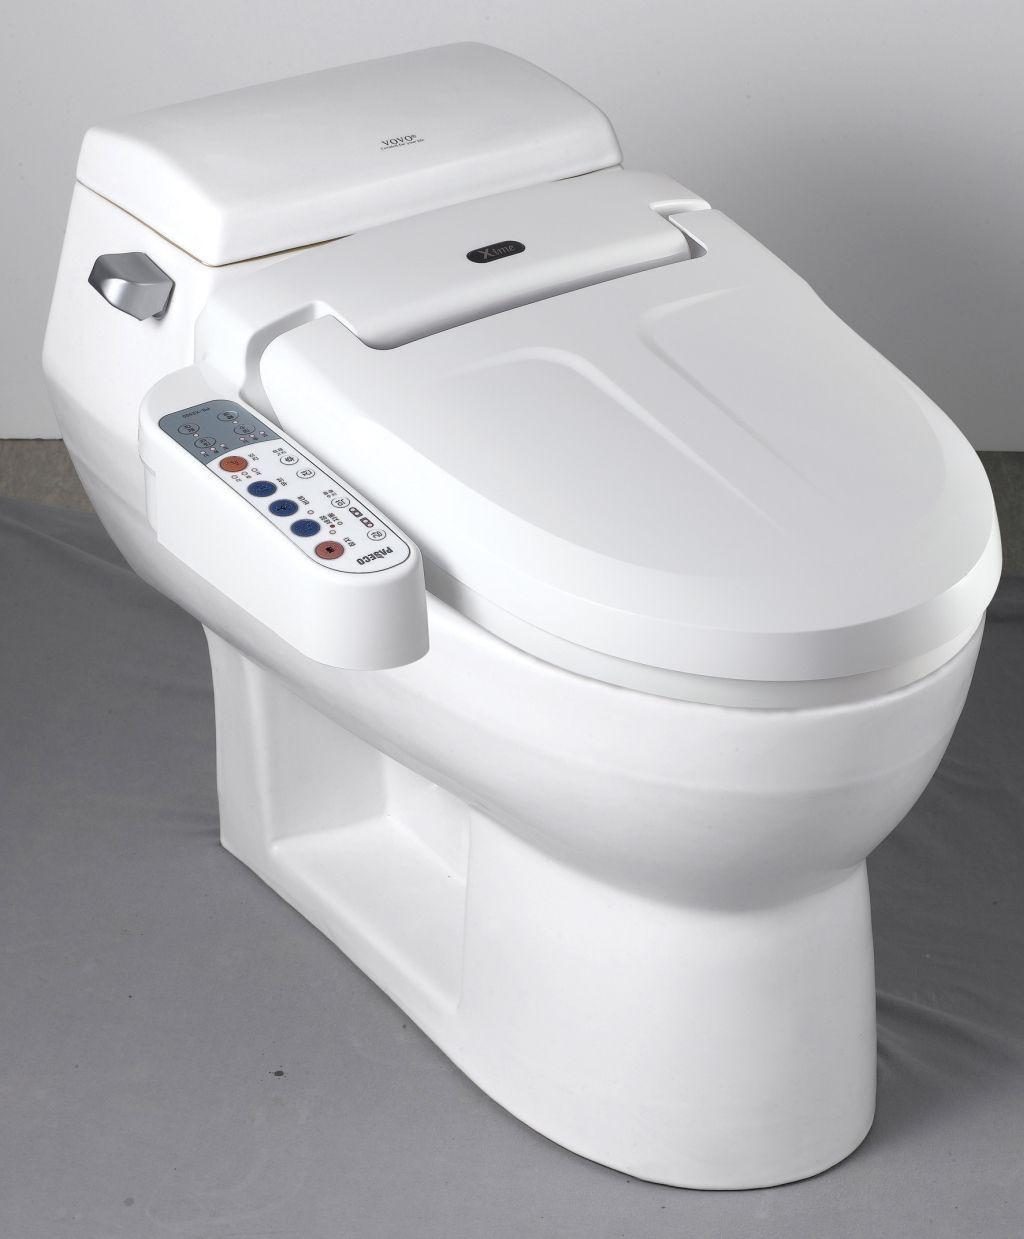 We Will Have A Bidet Someday With A Nice Warm Cushy Seat Bidet Toilet Combo Bidet Toilet Seat Bidet